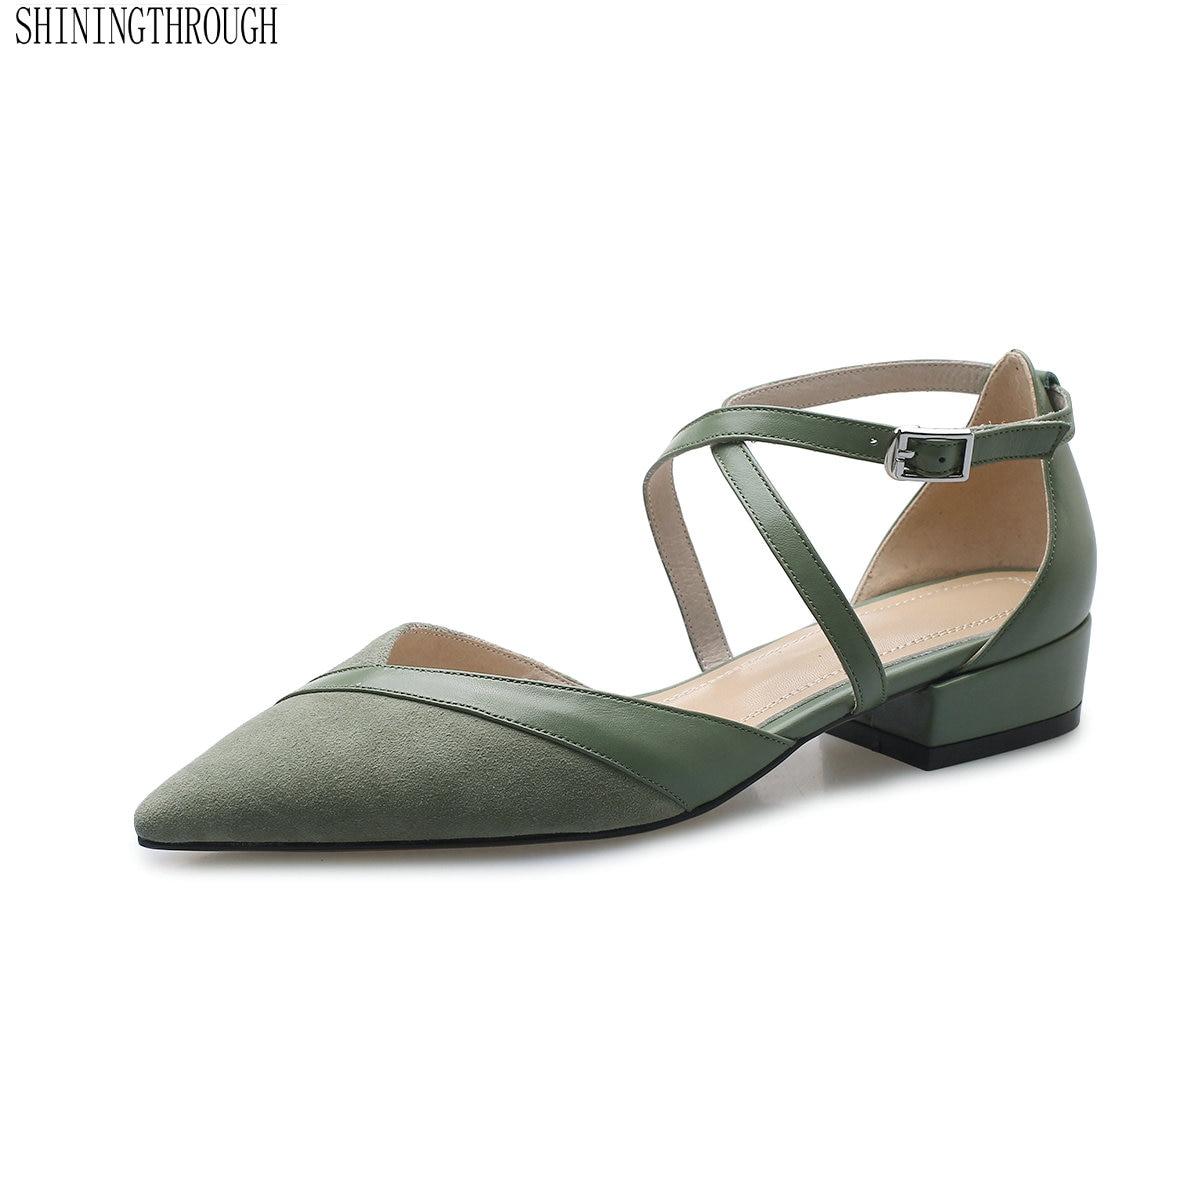 f0fe820ba07685 Frau Ferse Marke Leder schwarzes Mädchen Poined Beige Zehe Fashion Frauen  Niedrigen Arbeit grün Heels Neue Echtem Schuhe 4wqw7F